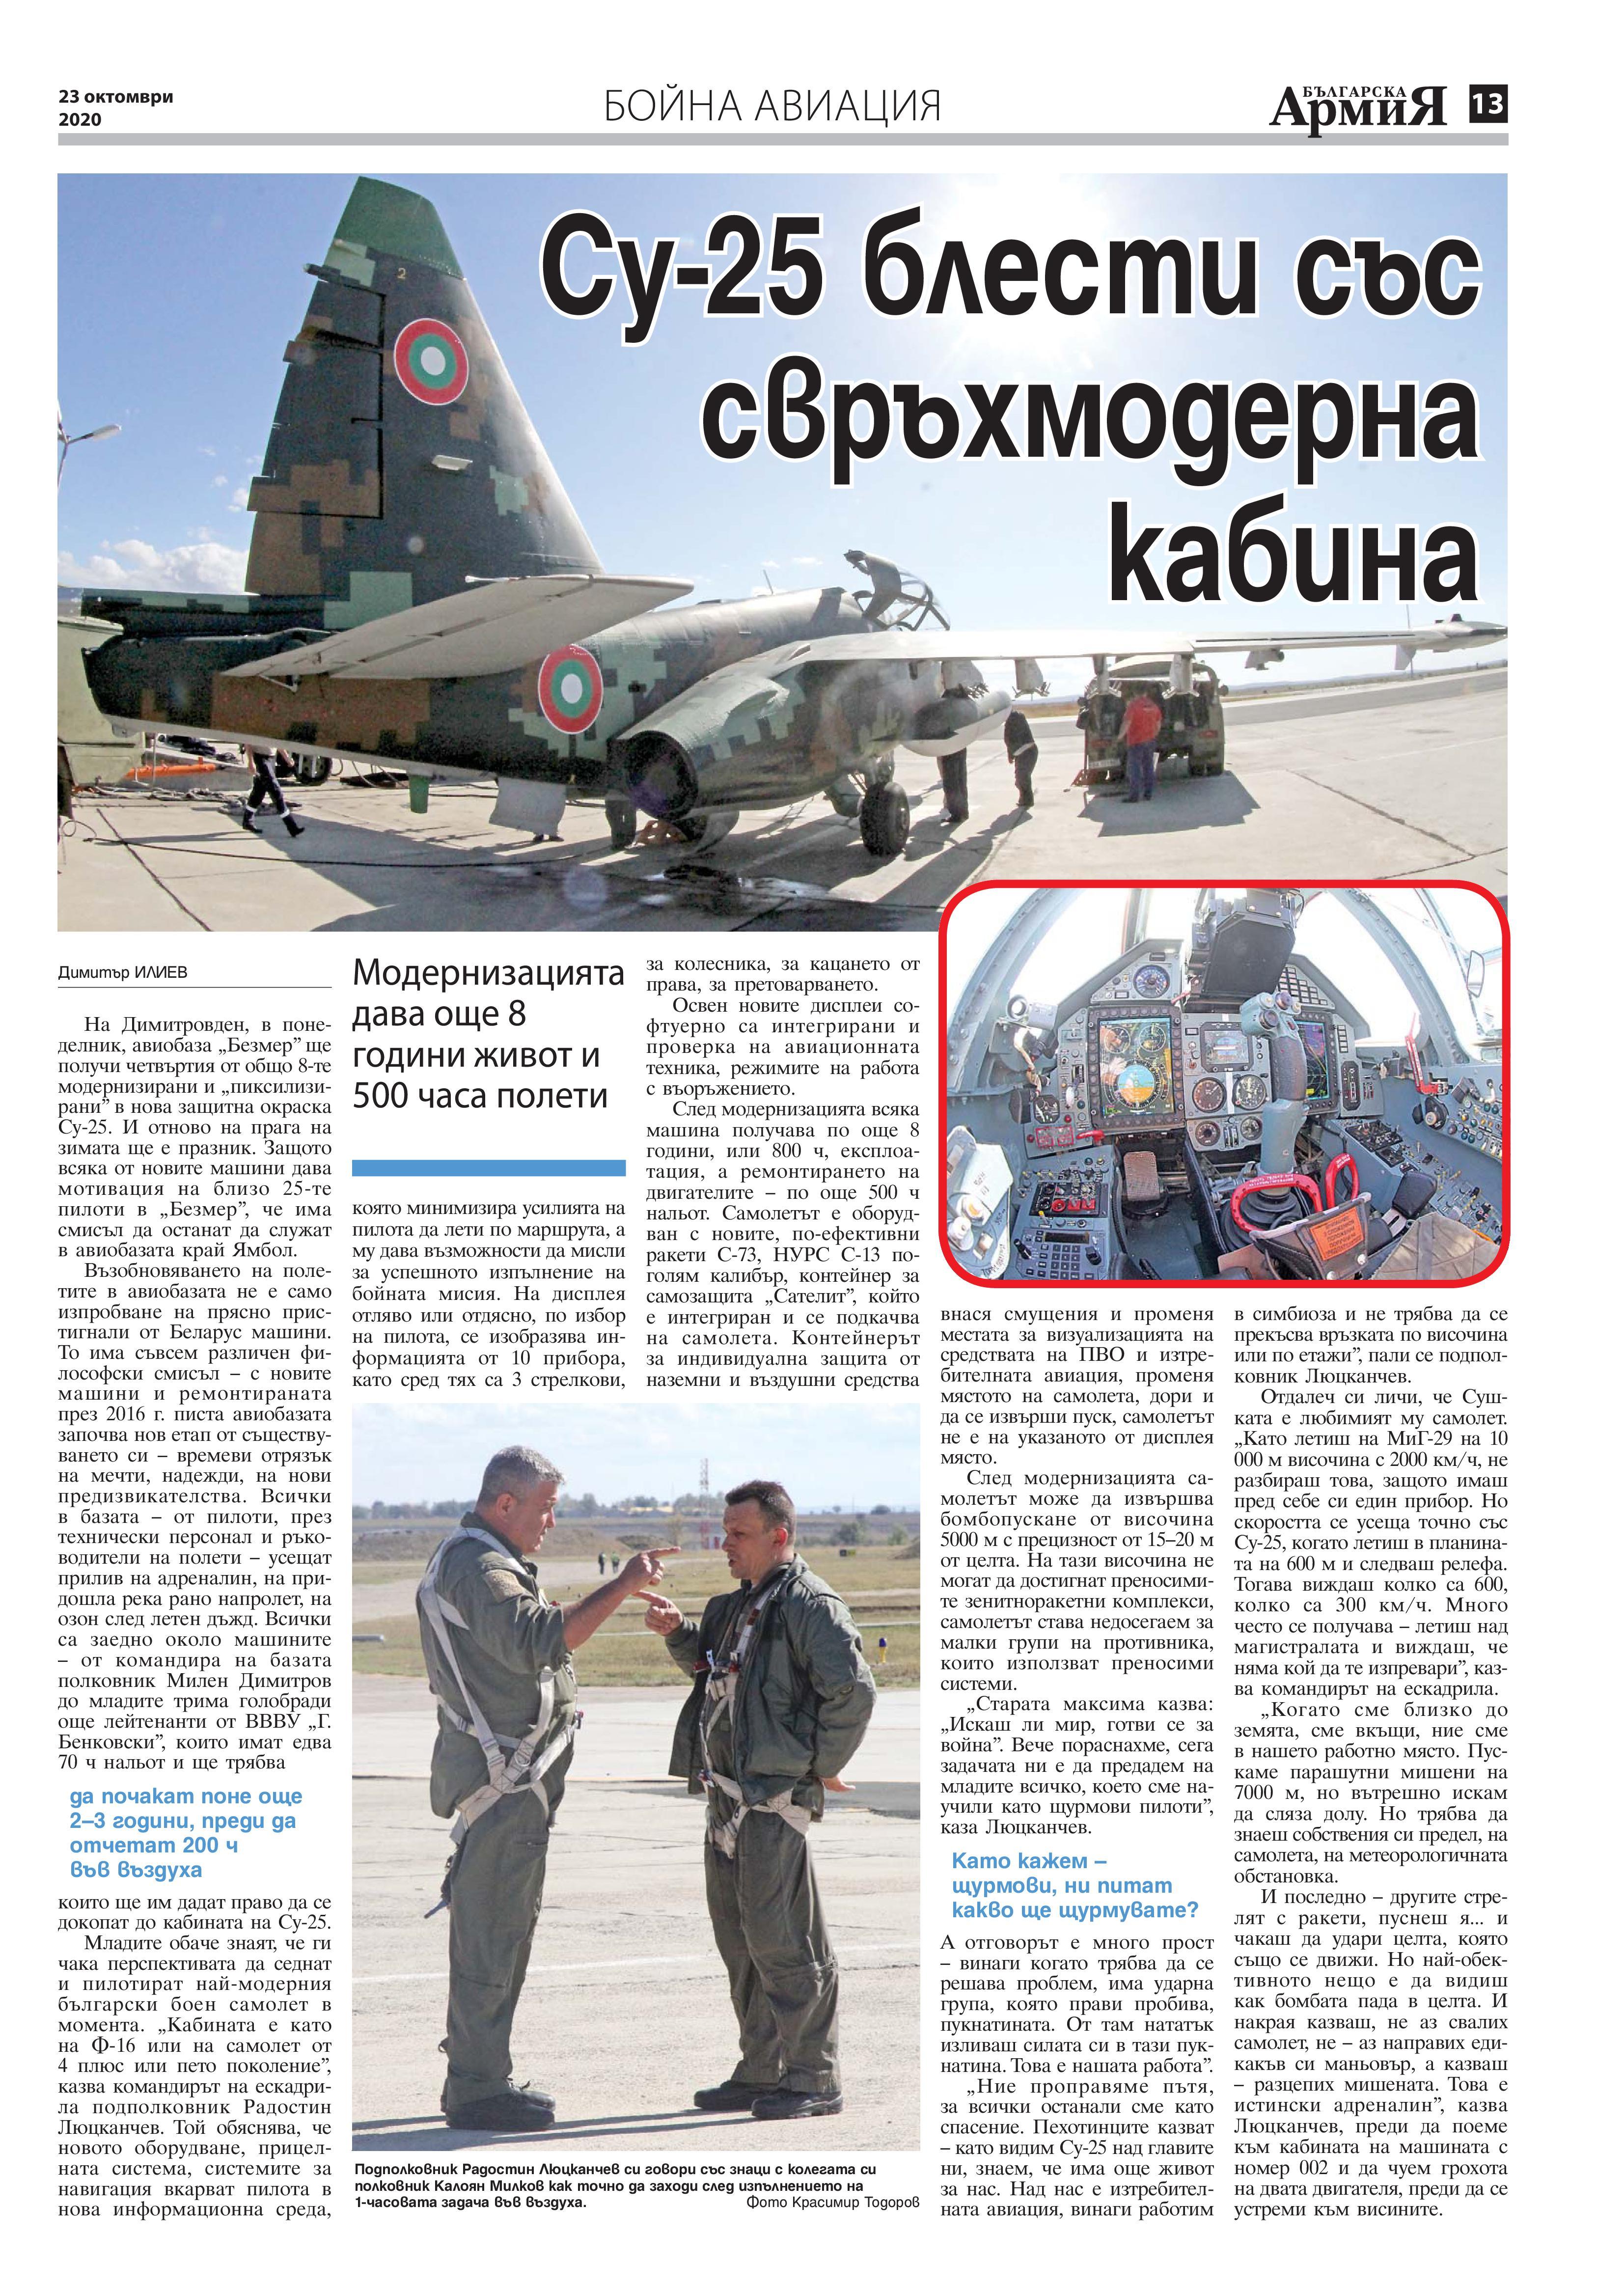 https://armymedia.bg/wp-content/uploads/2015/06/13-45.jpg